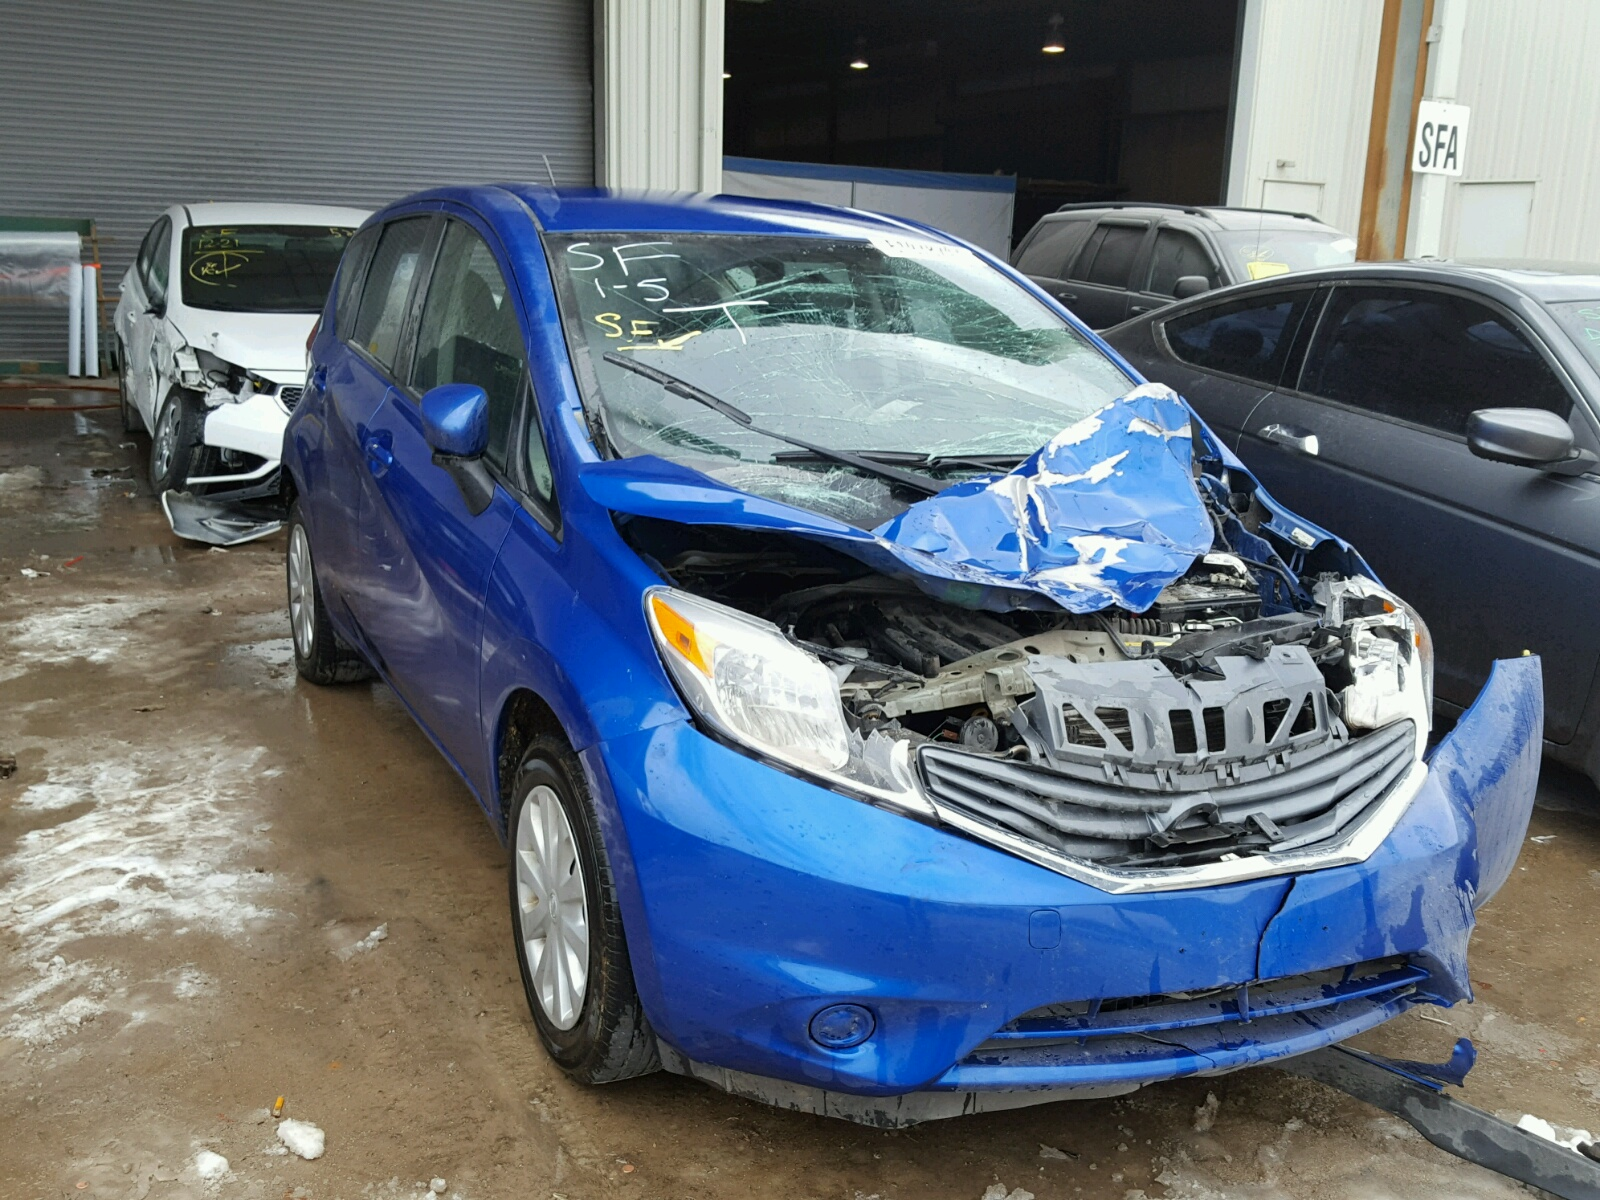 3n1cn7ap7fl924825 2015 Blue Nissan Versa S S On Sale In